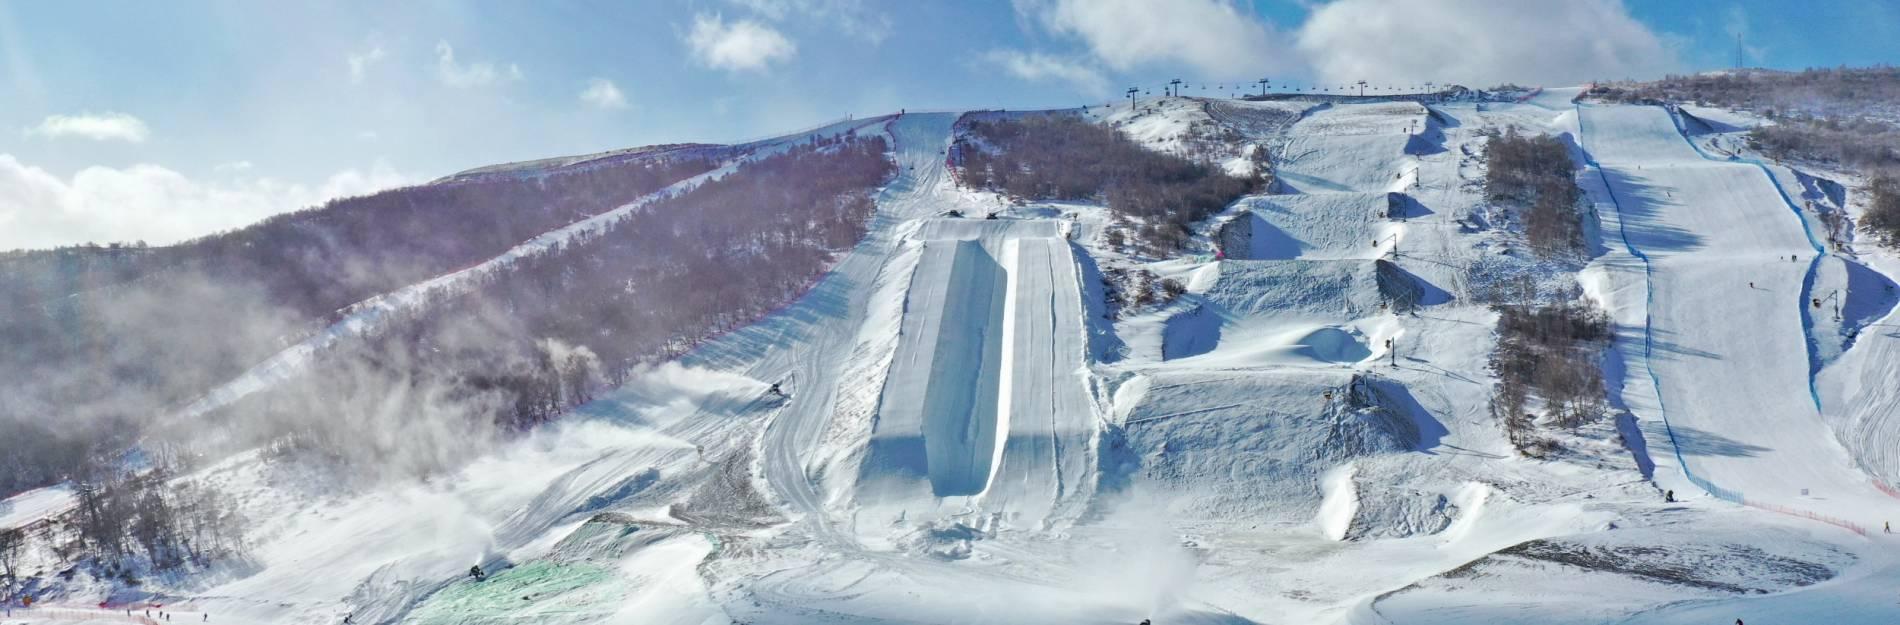 genting-snow-park-7128